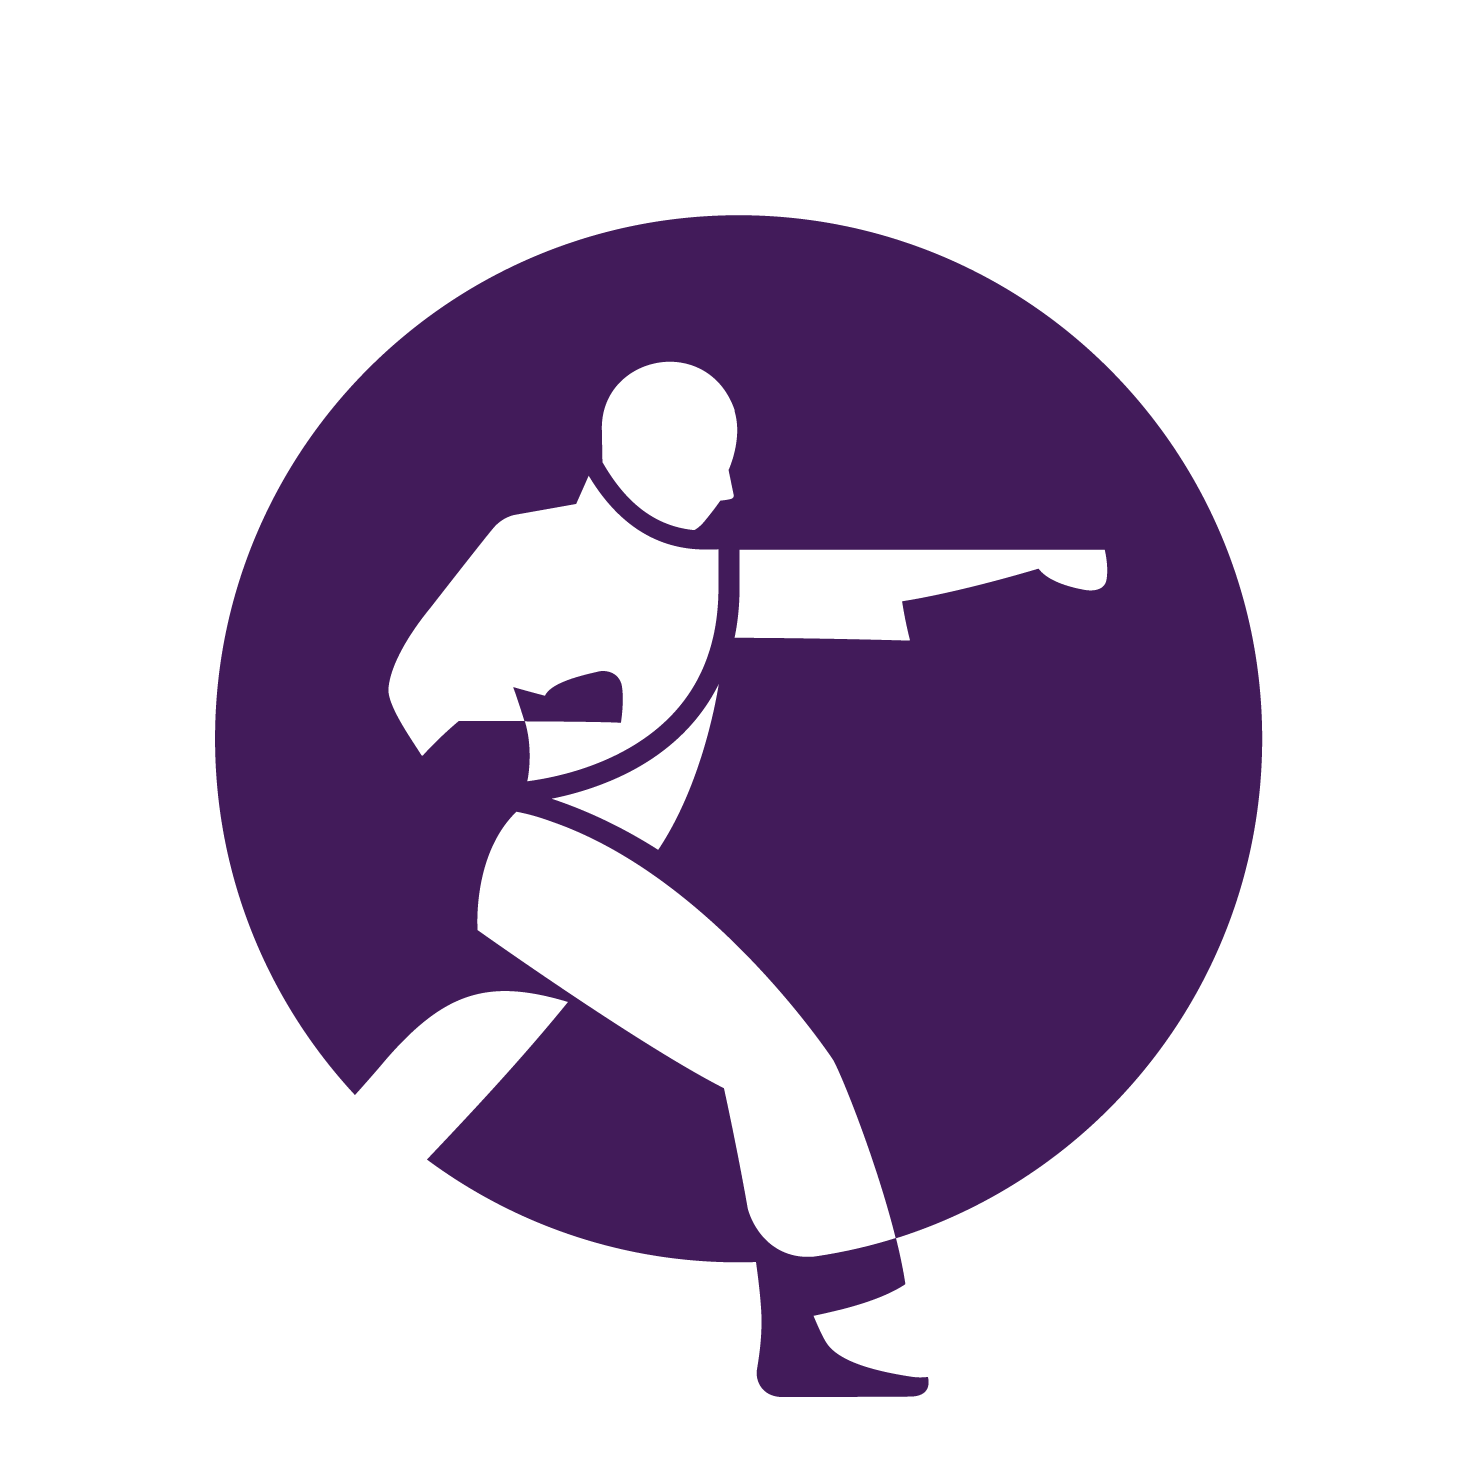 Fighting clipart wing chun. Taekwondo symbol pesquisa google